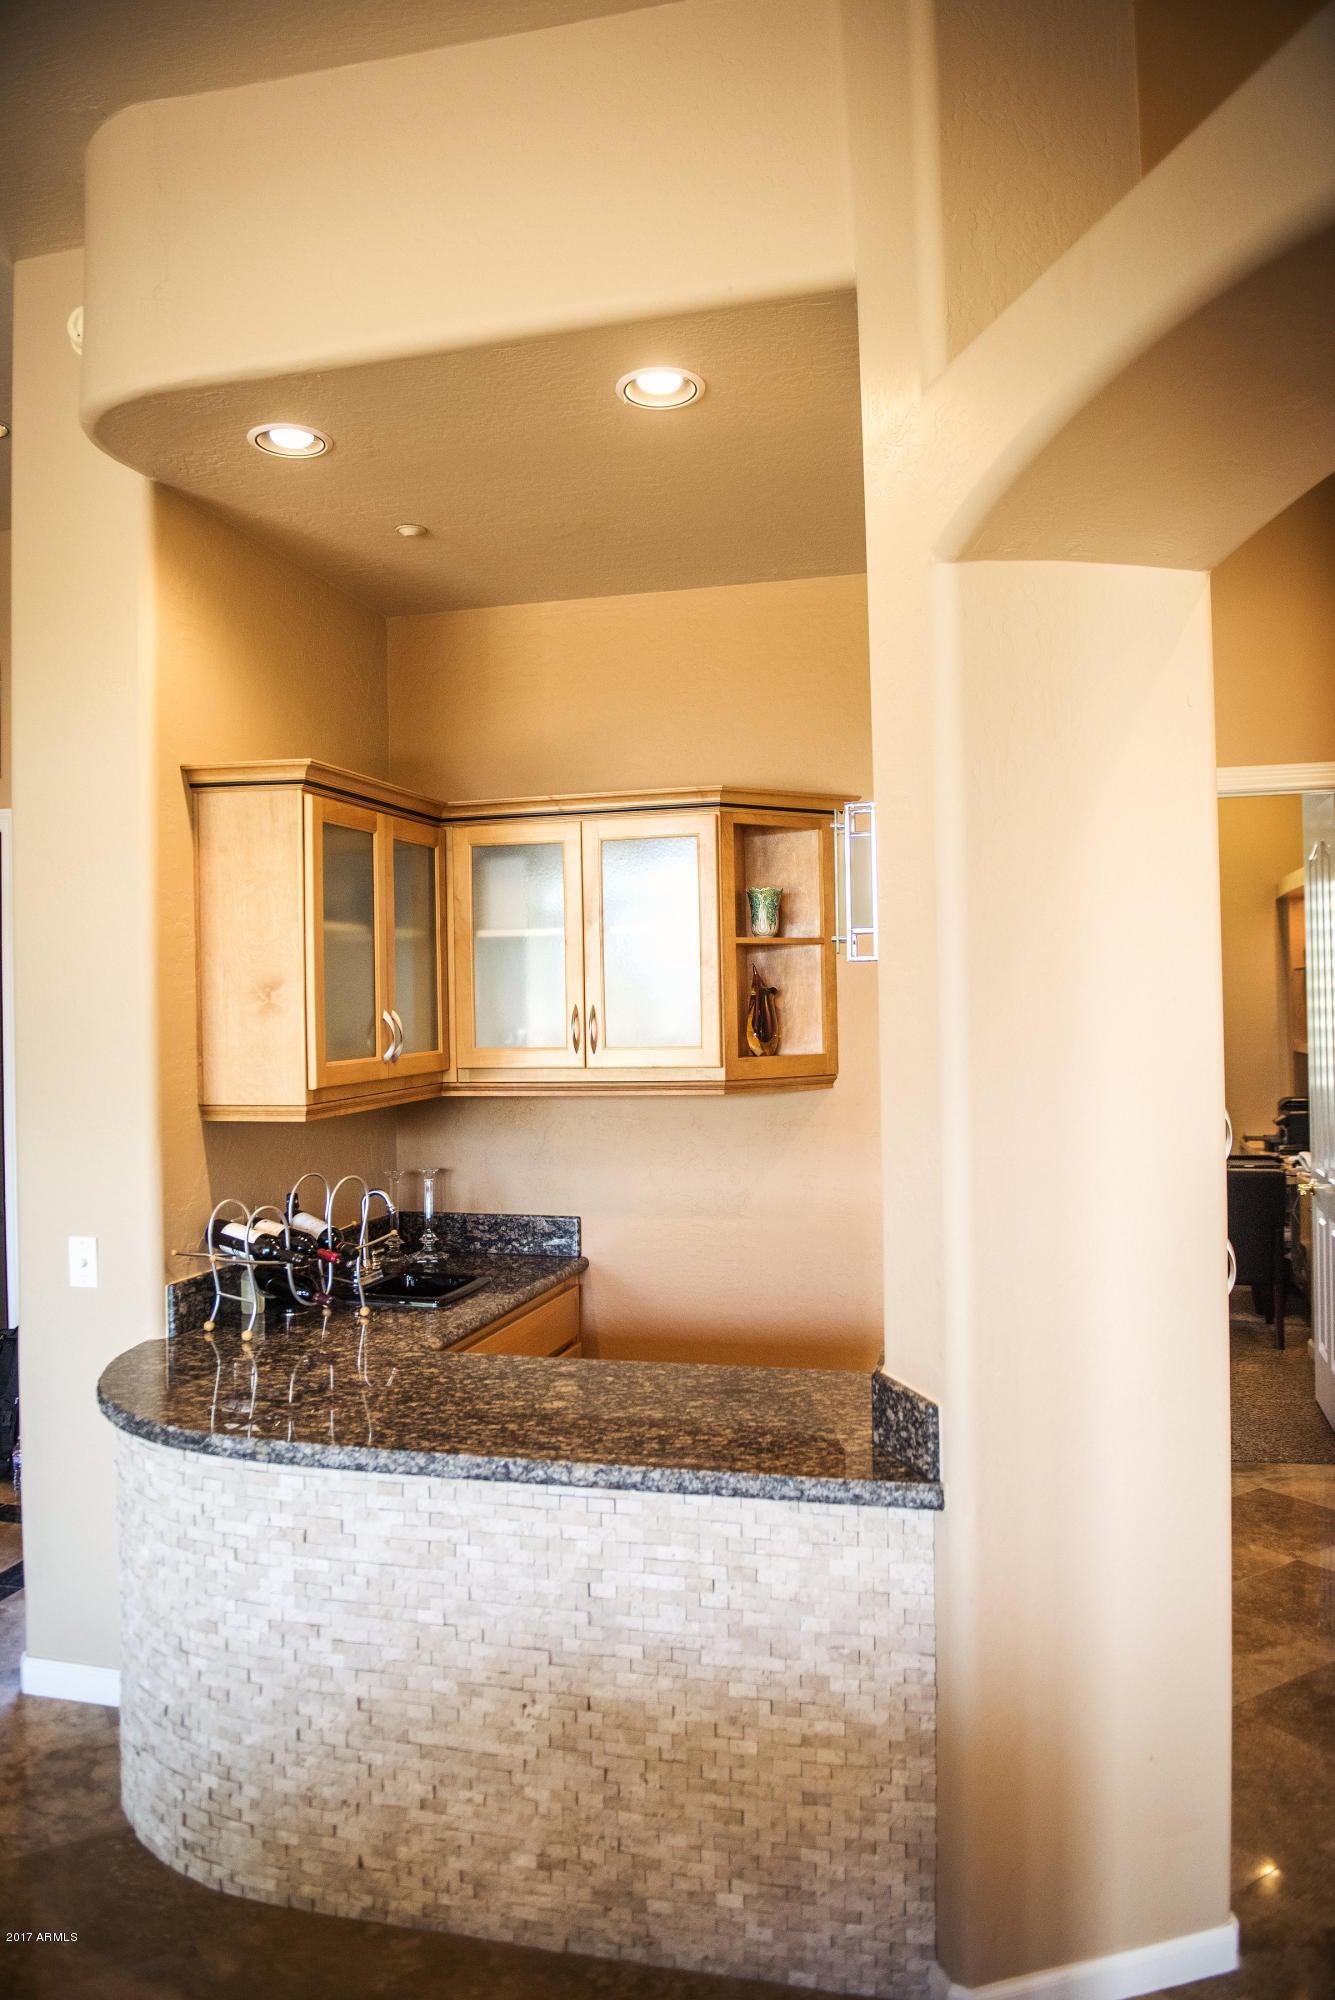 9290 E THOMPSON PEAK Parkway Unit 209 Scottsdale, AZ 85255 - MLS #: 5646861